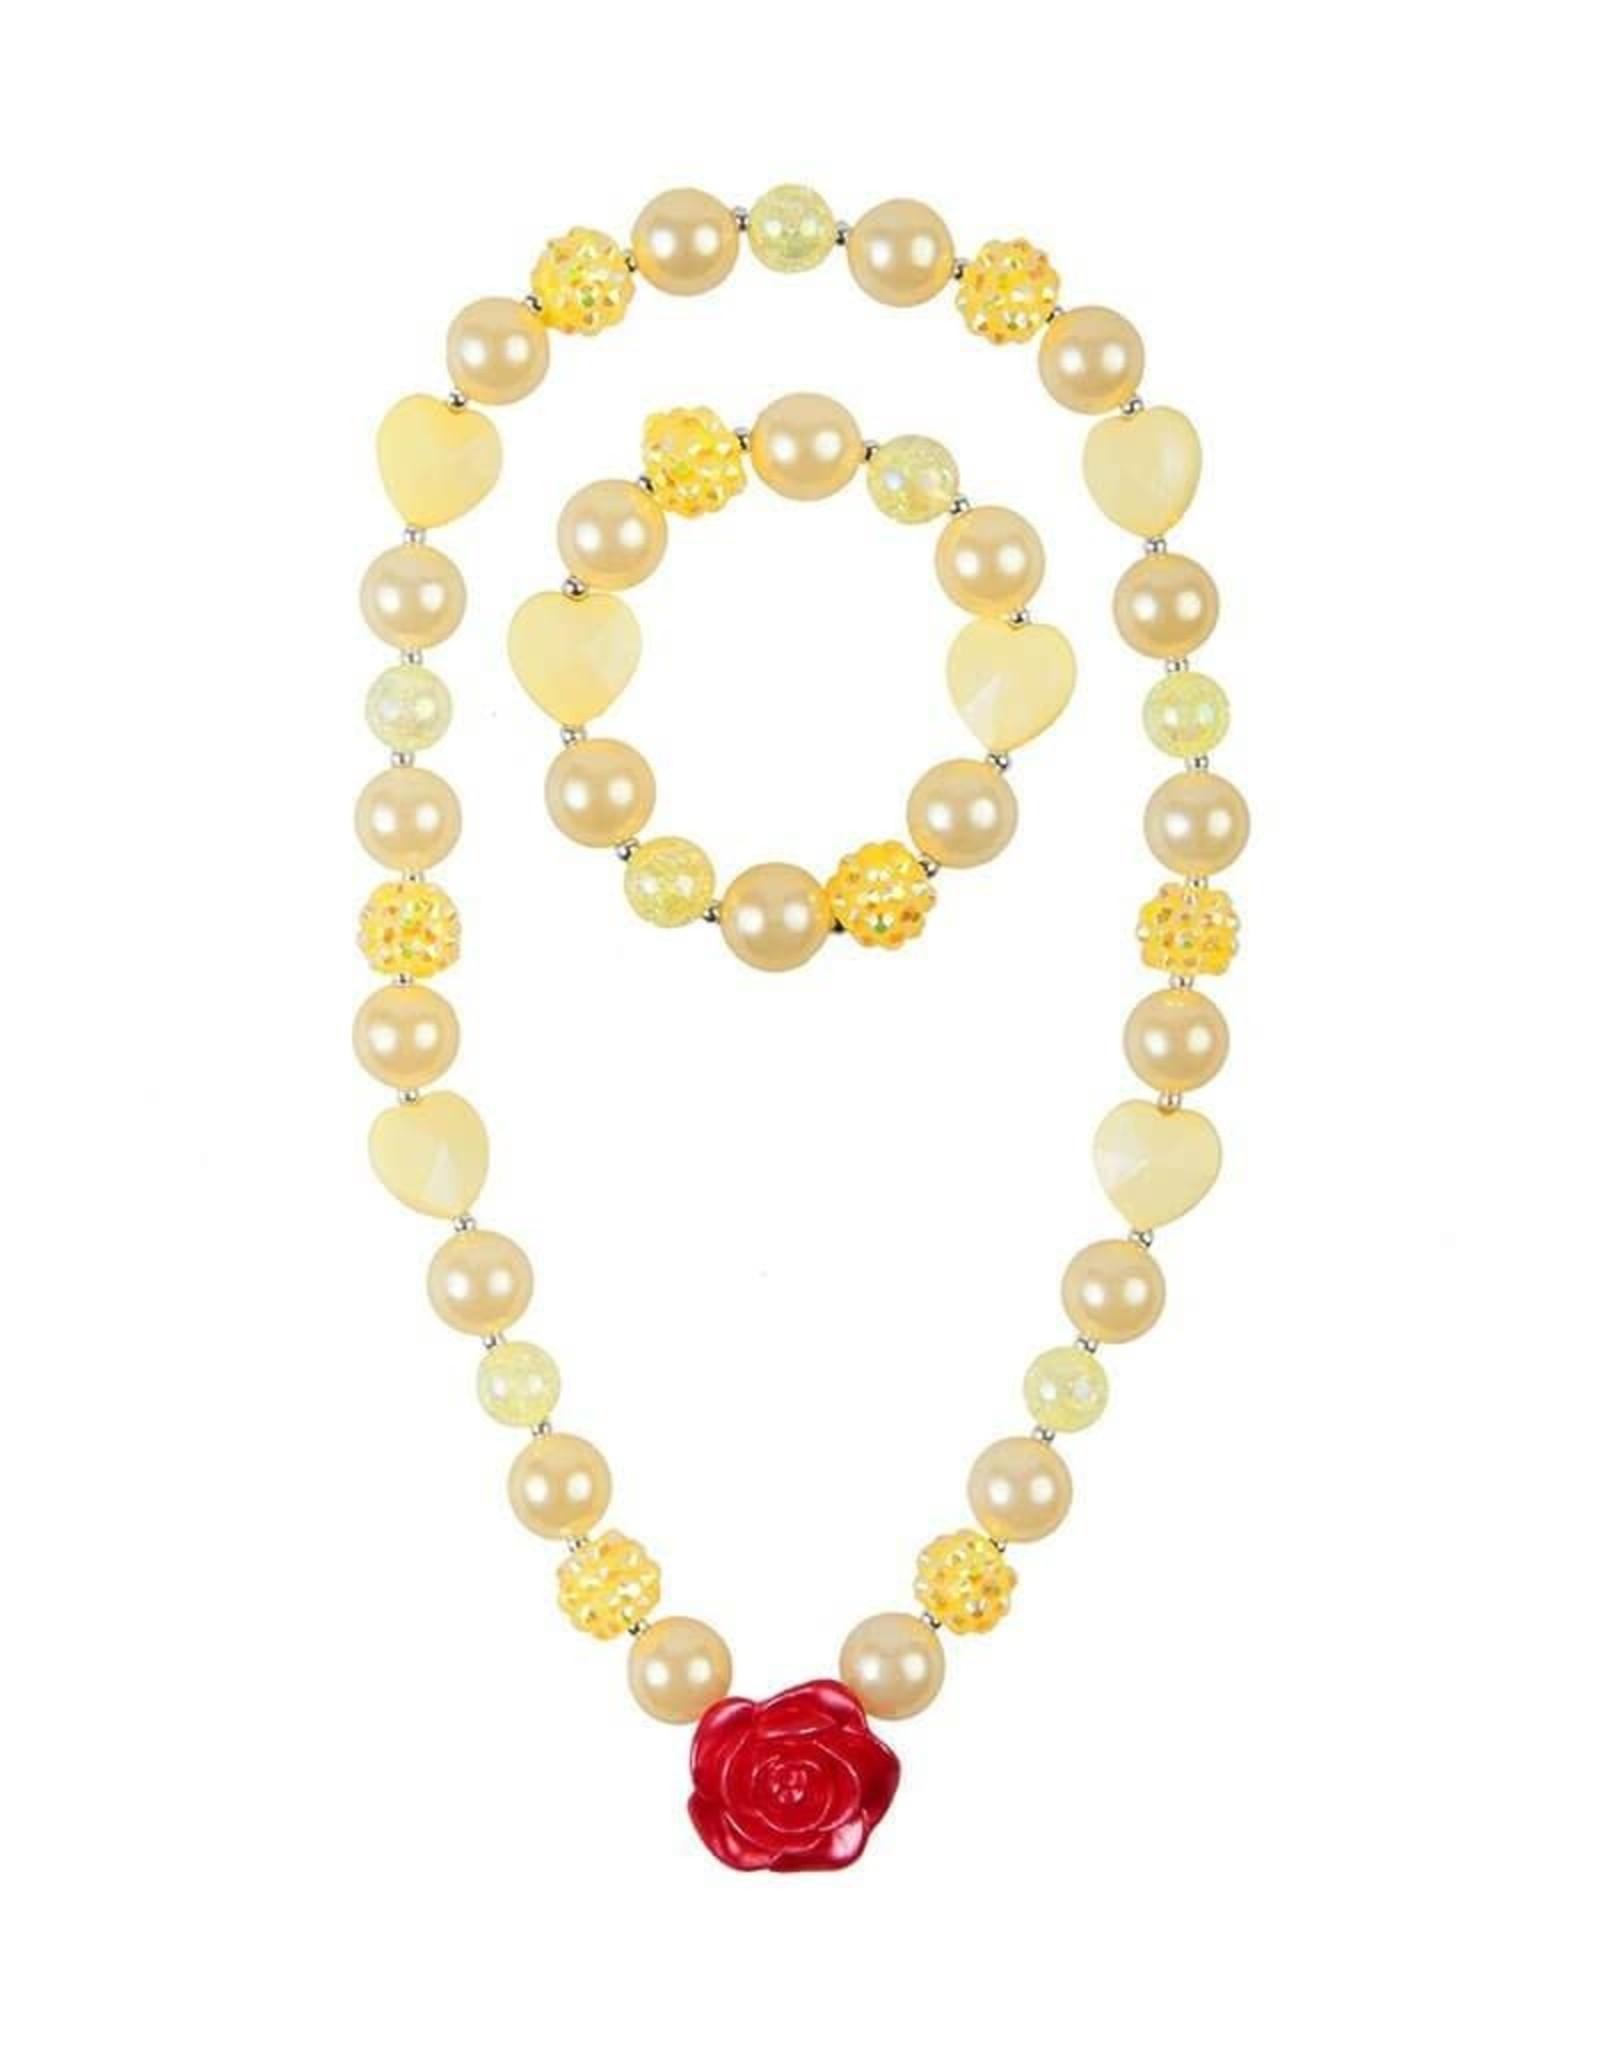 Great Pretenders Creative Education Belle Beautiful Rose Necklace Set (2 pcs)